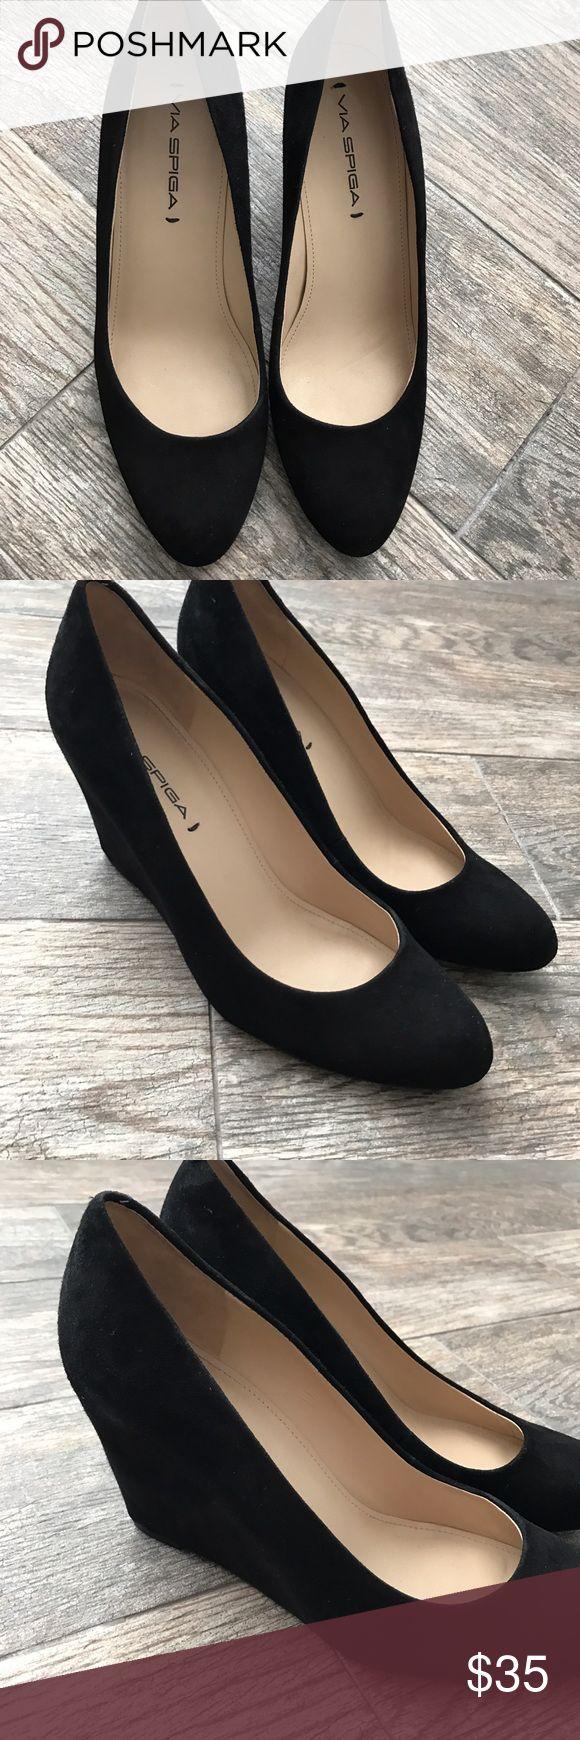 "VIA SPIGA Farley Wedge Pump VIA SPIGA Farley Suede Wedge Pump. 3"" covered wedge heel. Very comfortable wedge heels! Normal wear and tear. Still lots of life in them. Via Spiga Shoes Heels"